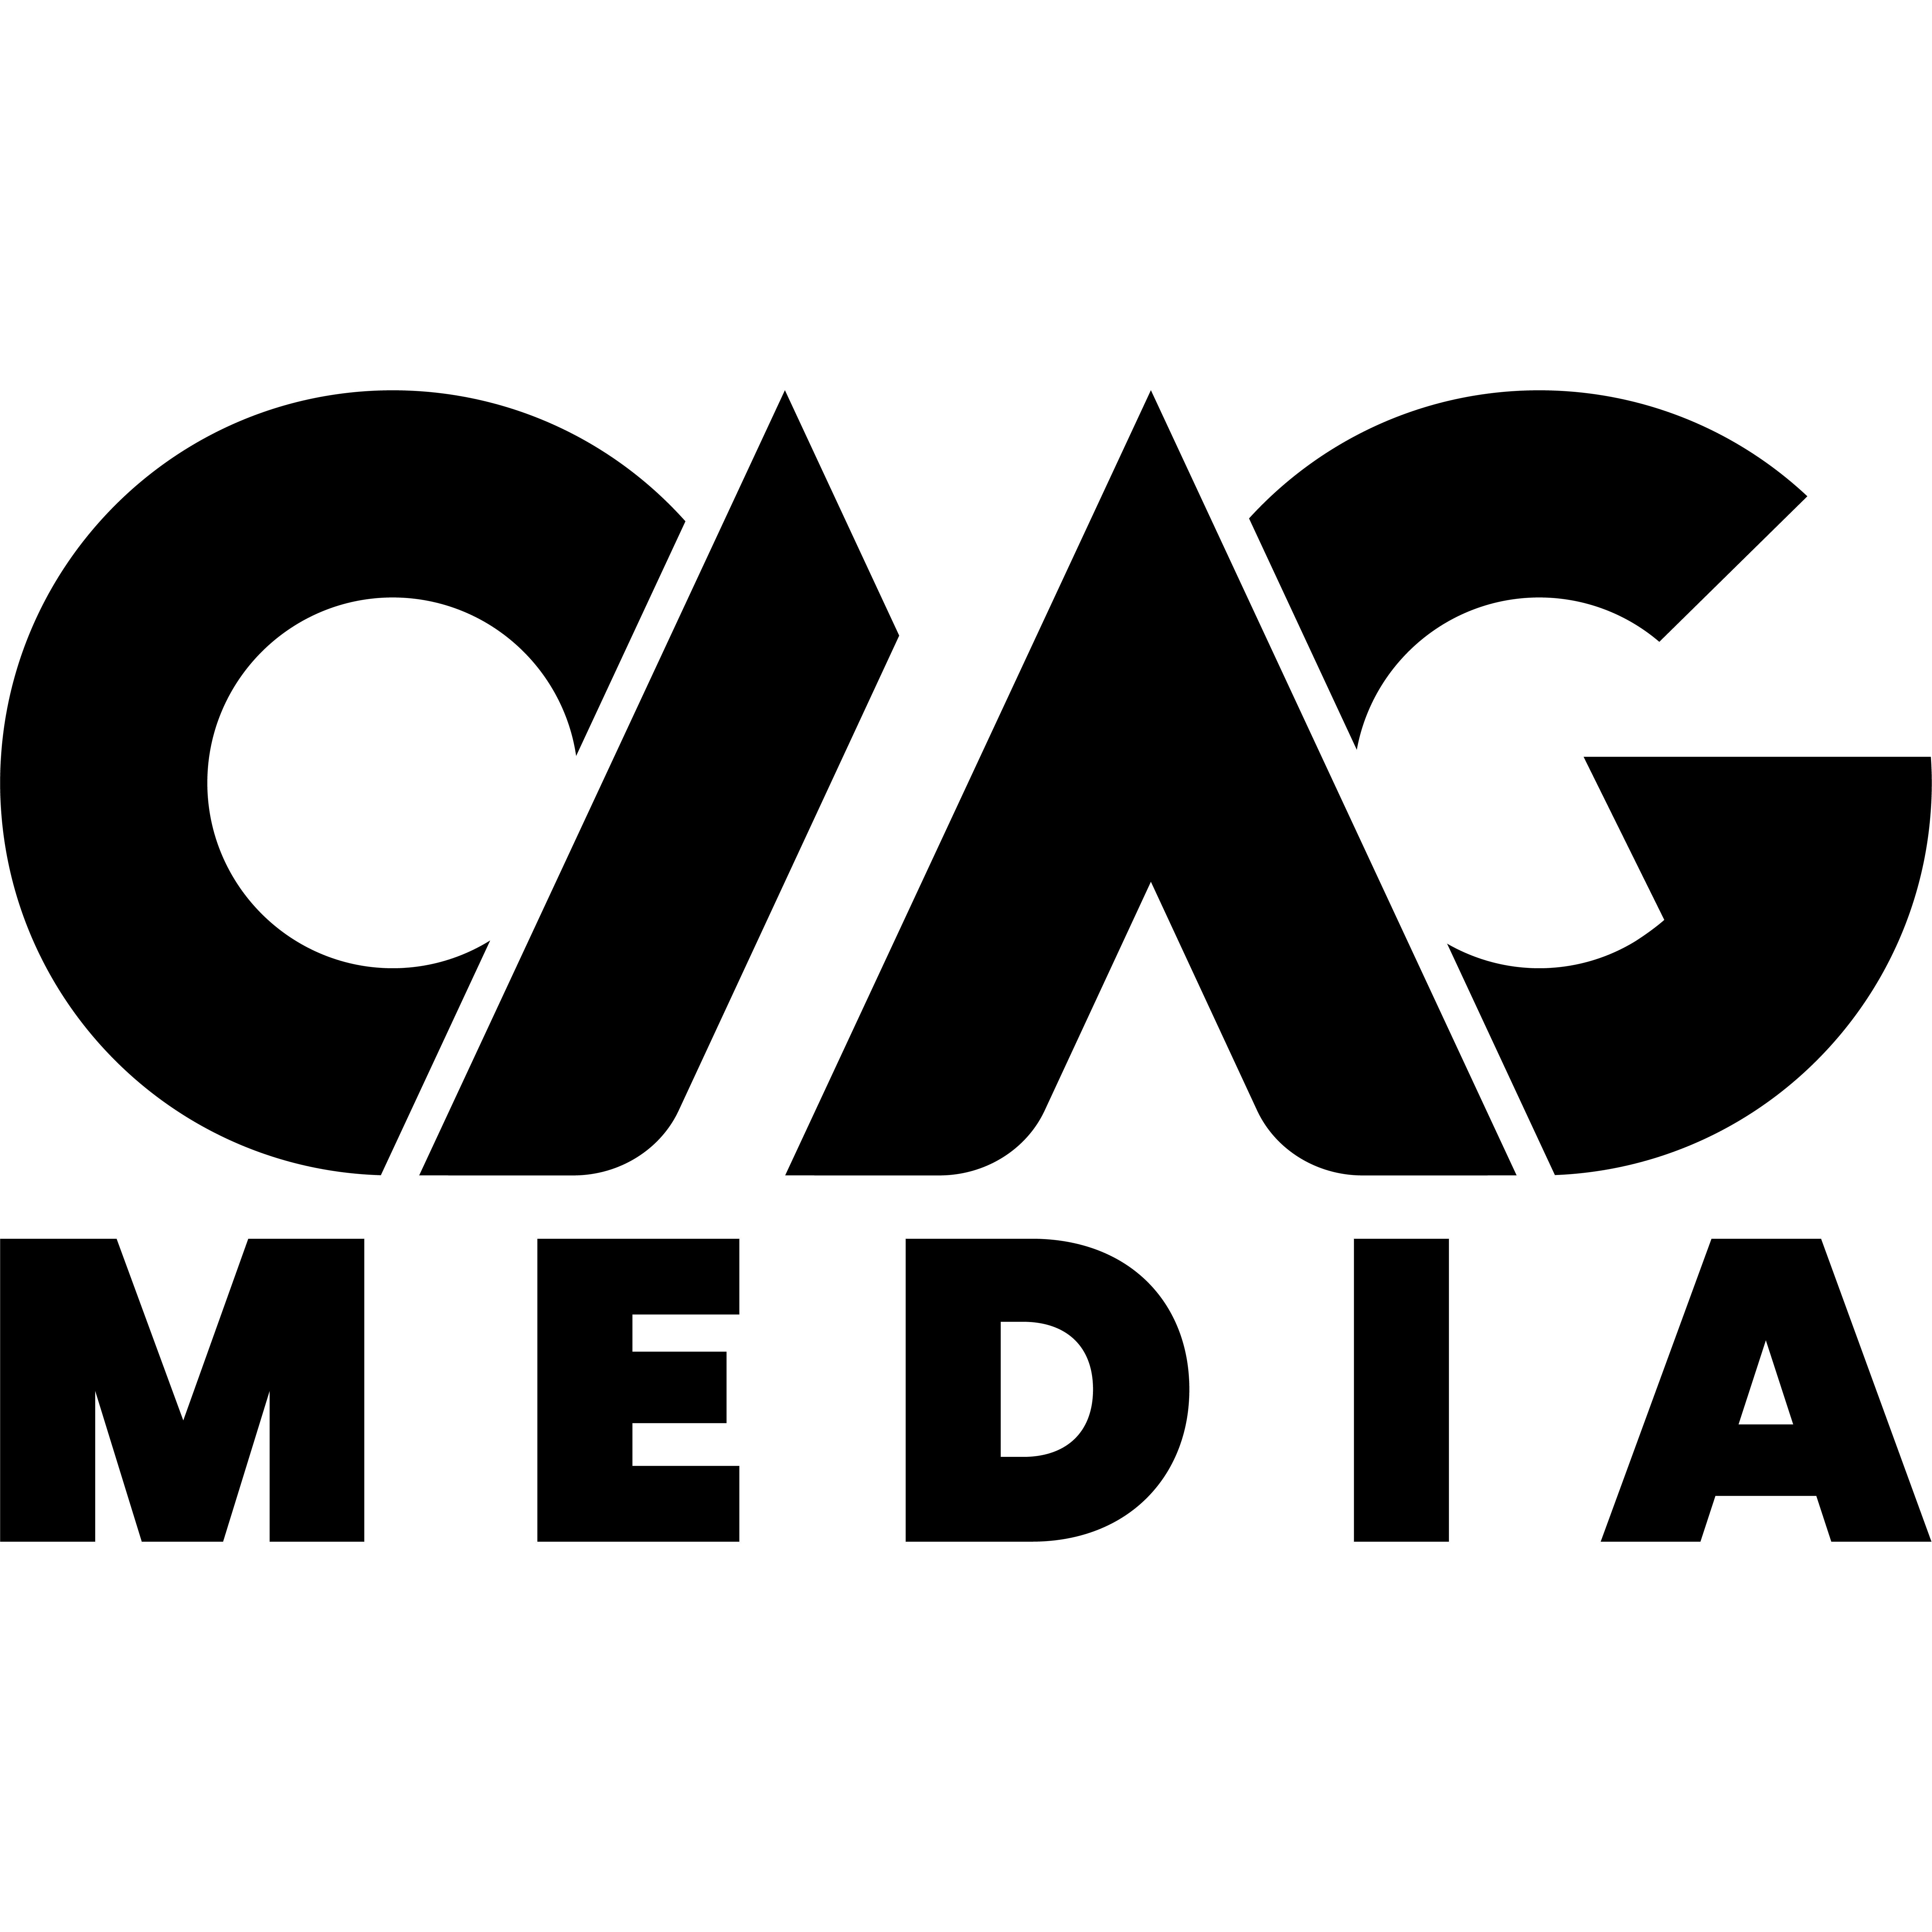 OMG MEDIA GmbH